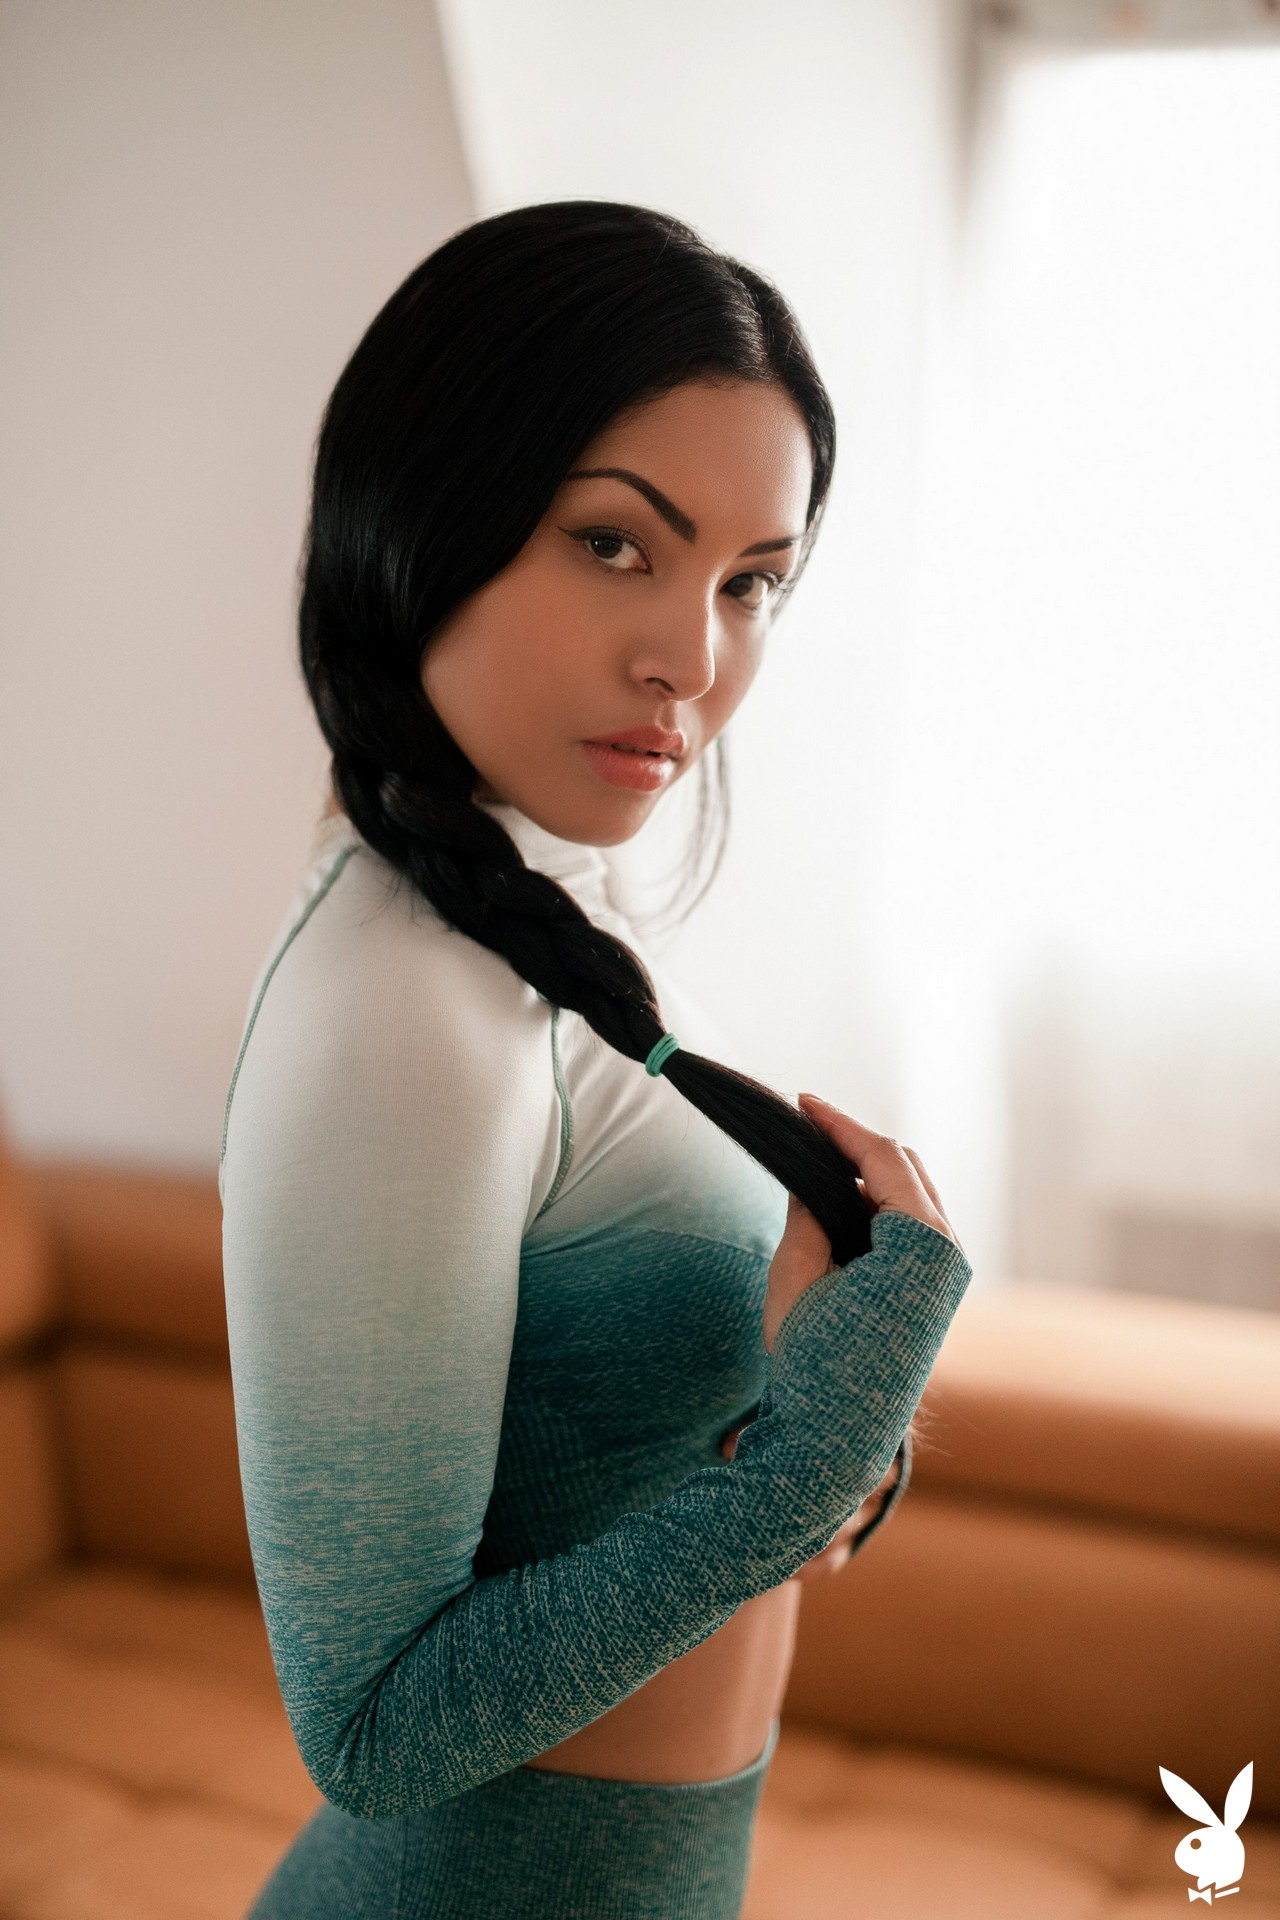 Chloe Rose In Feeling Energized Playboy Plus (2)